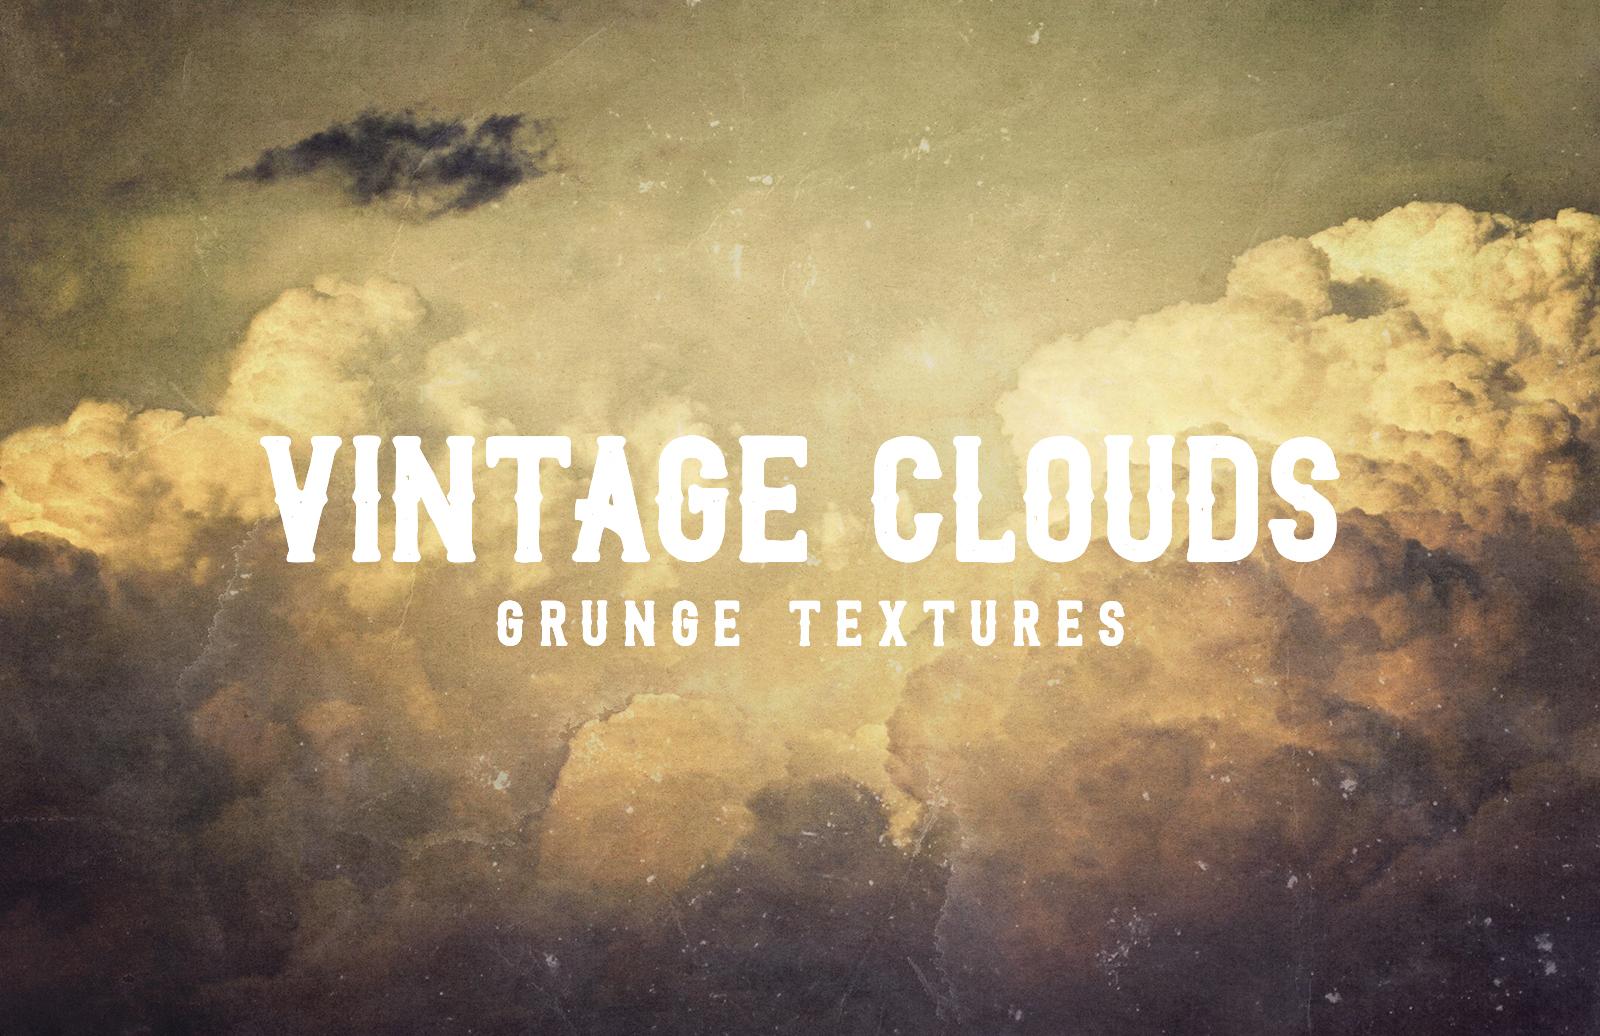 Vintage Clouds Grunge Textures